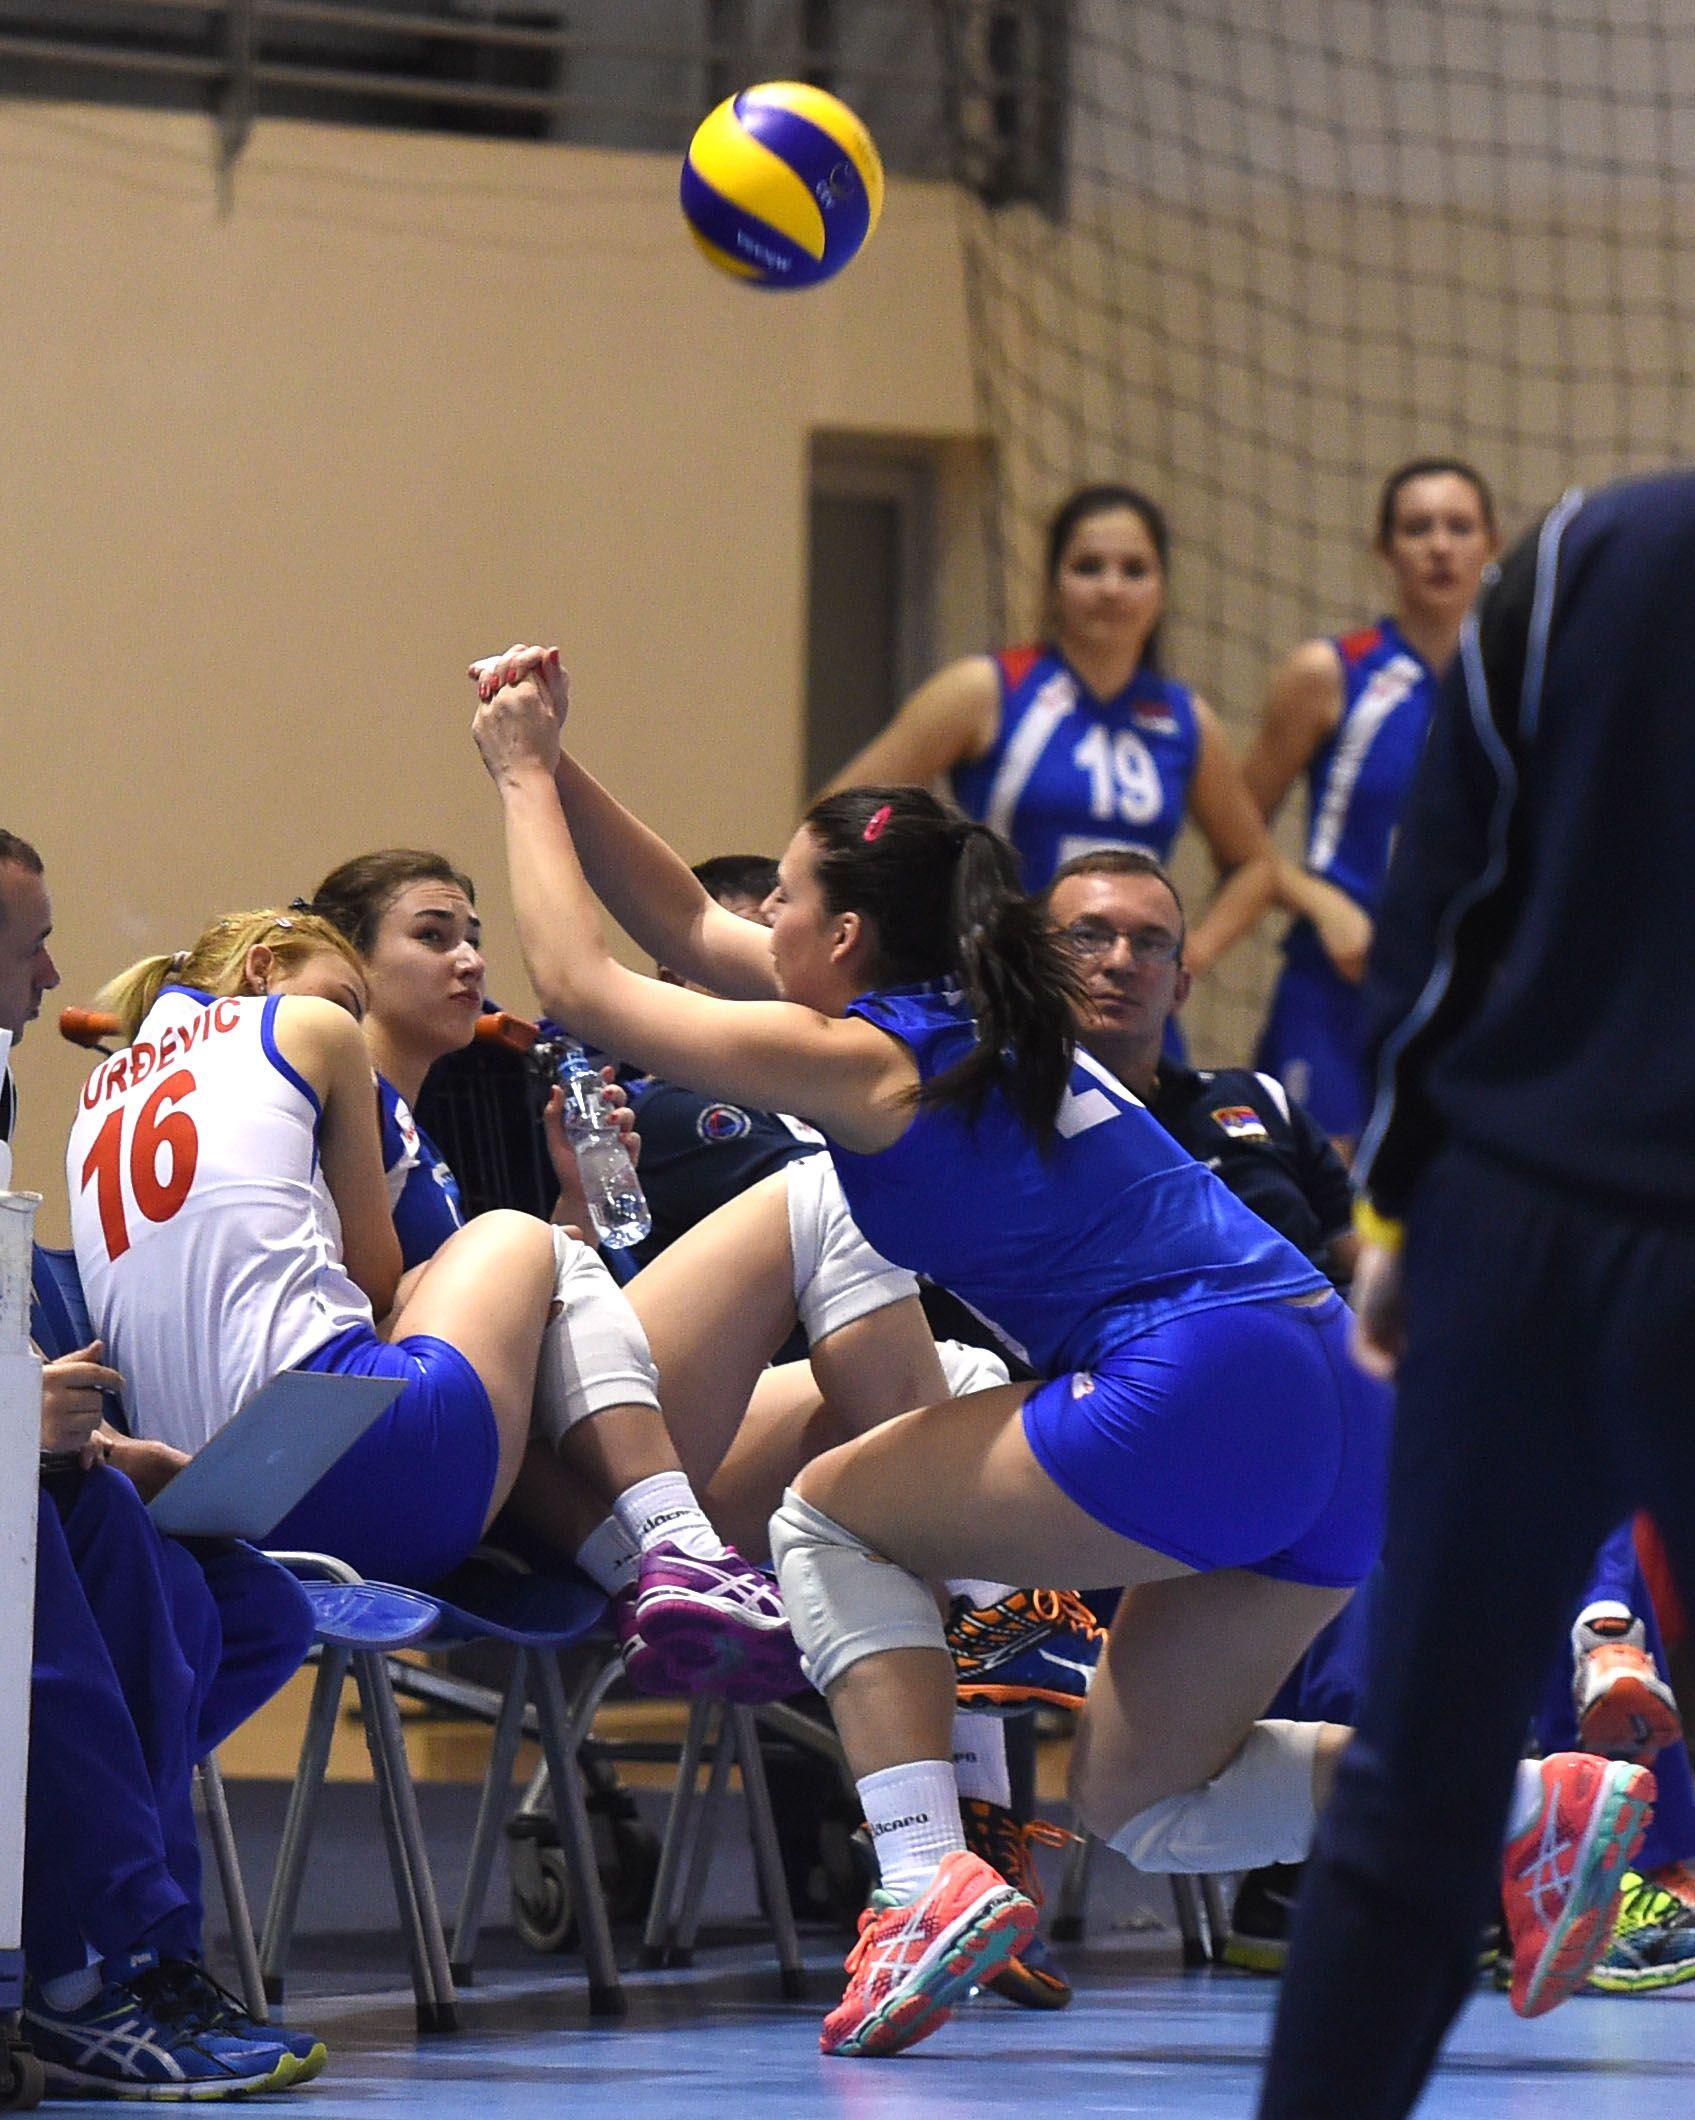 Volleyball Skill Katarina Lukic Volleyball Skills Volleyball Sumo Wrestling